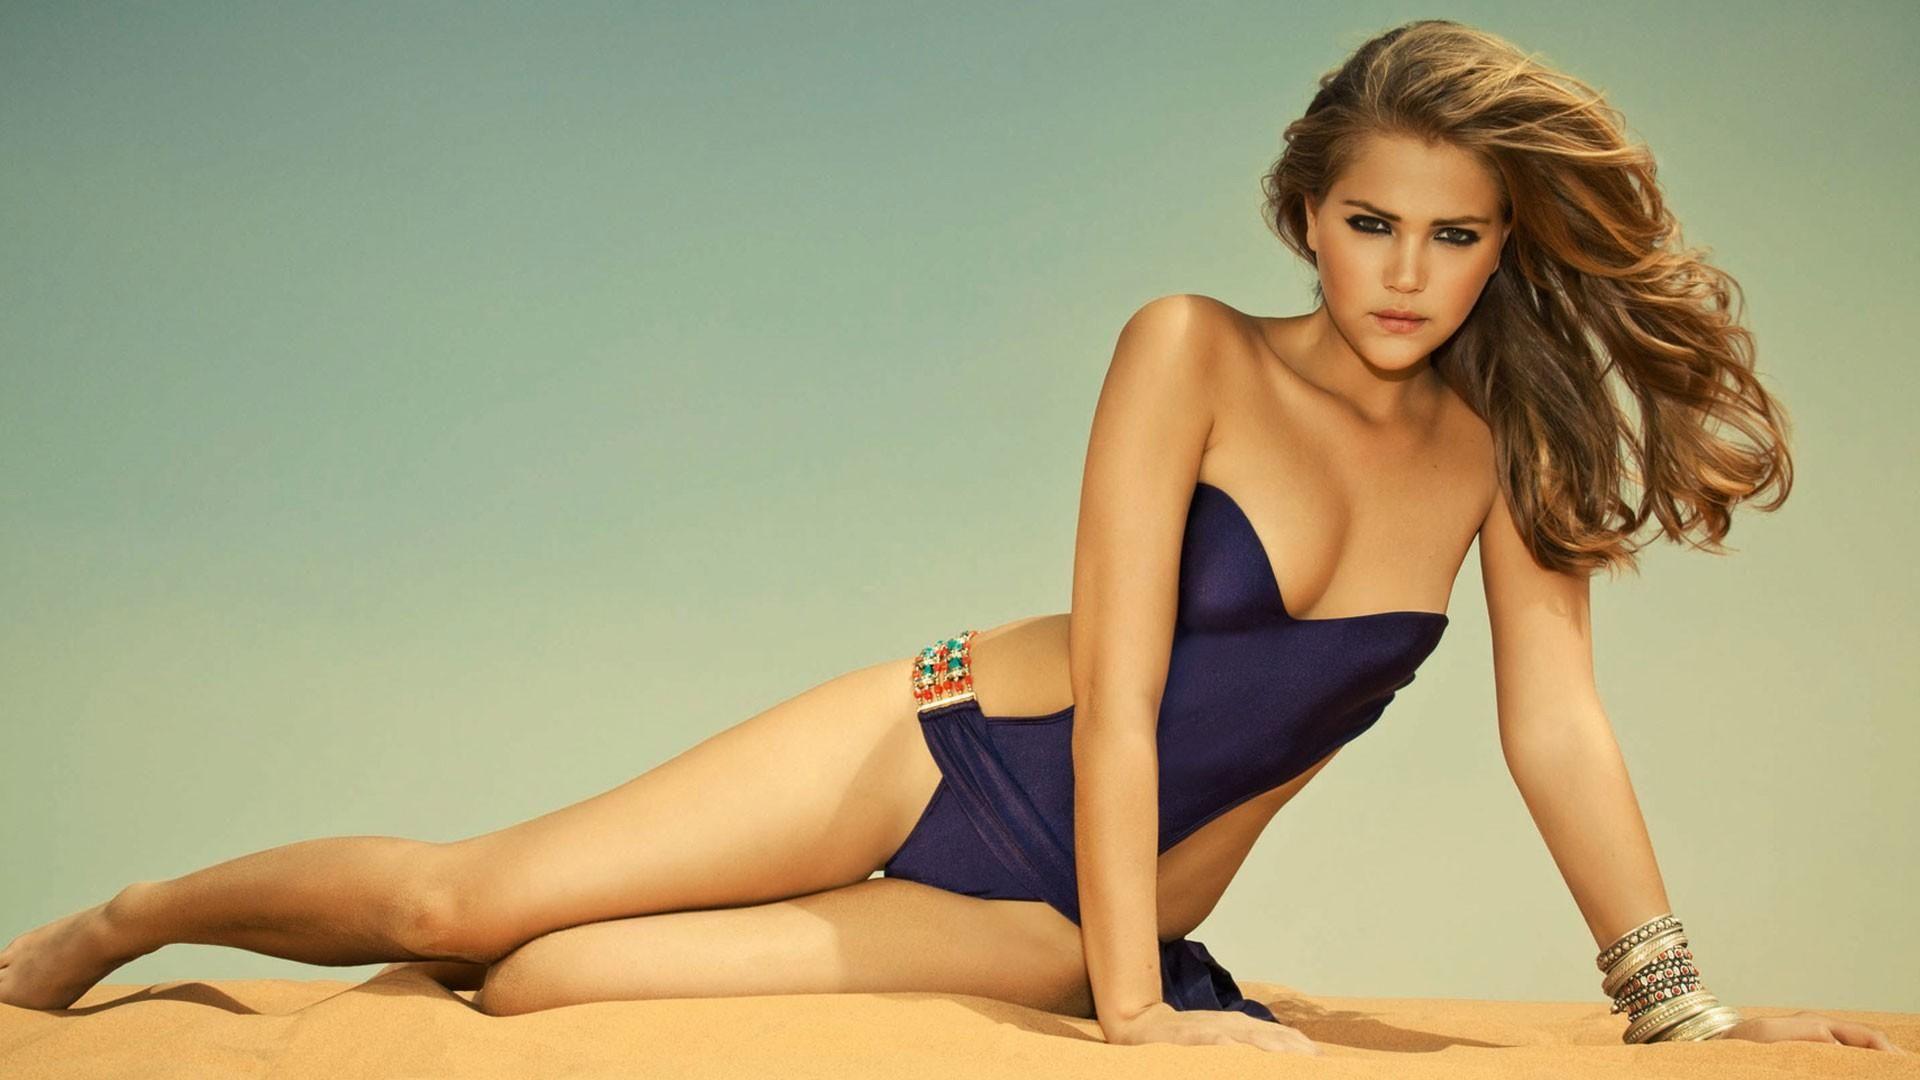 bikini girls wallpaper | hd wallpapers | pinterest | bikini girls